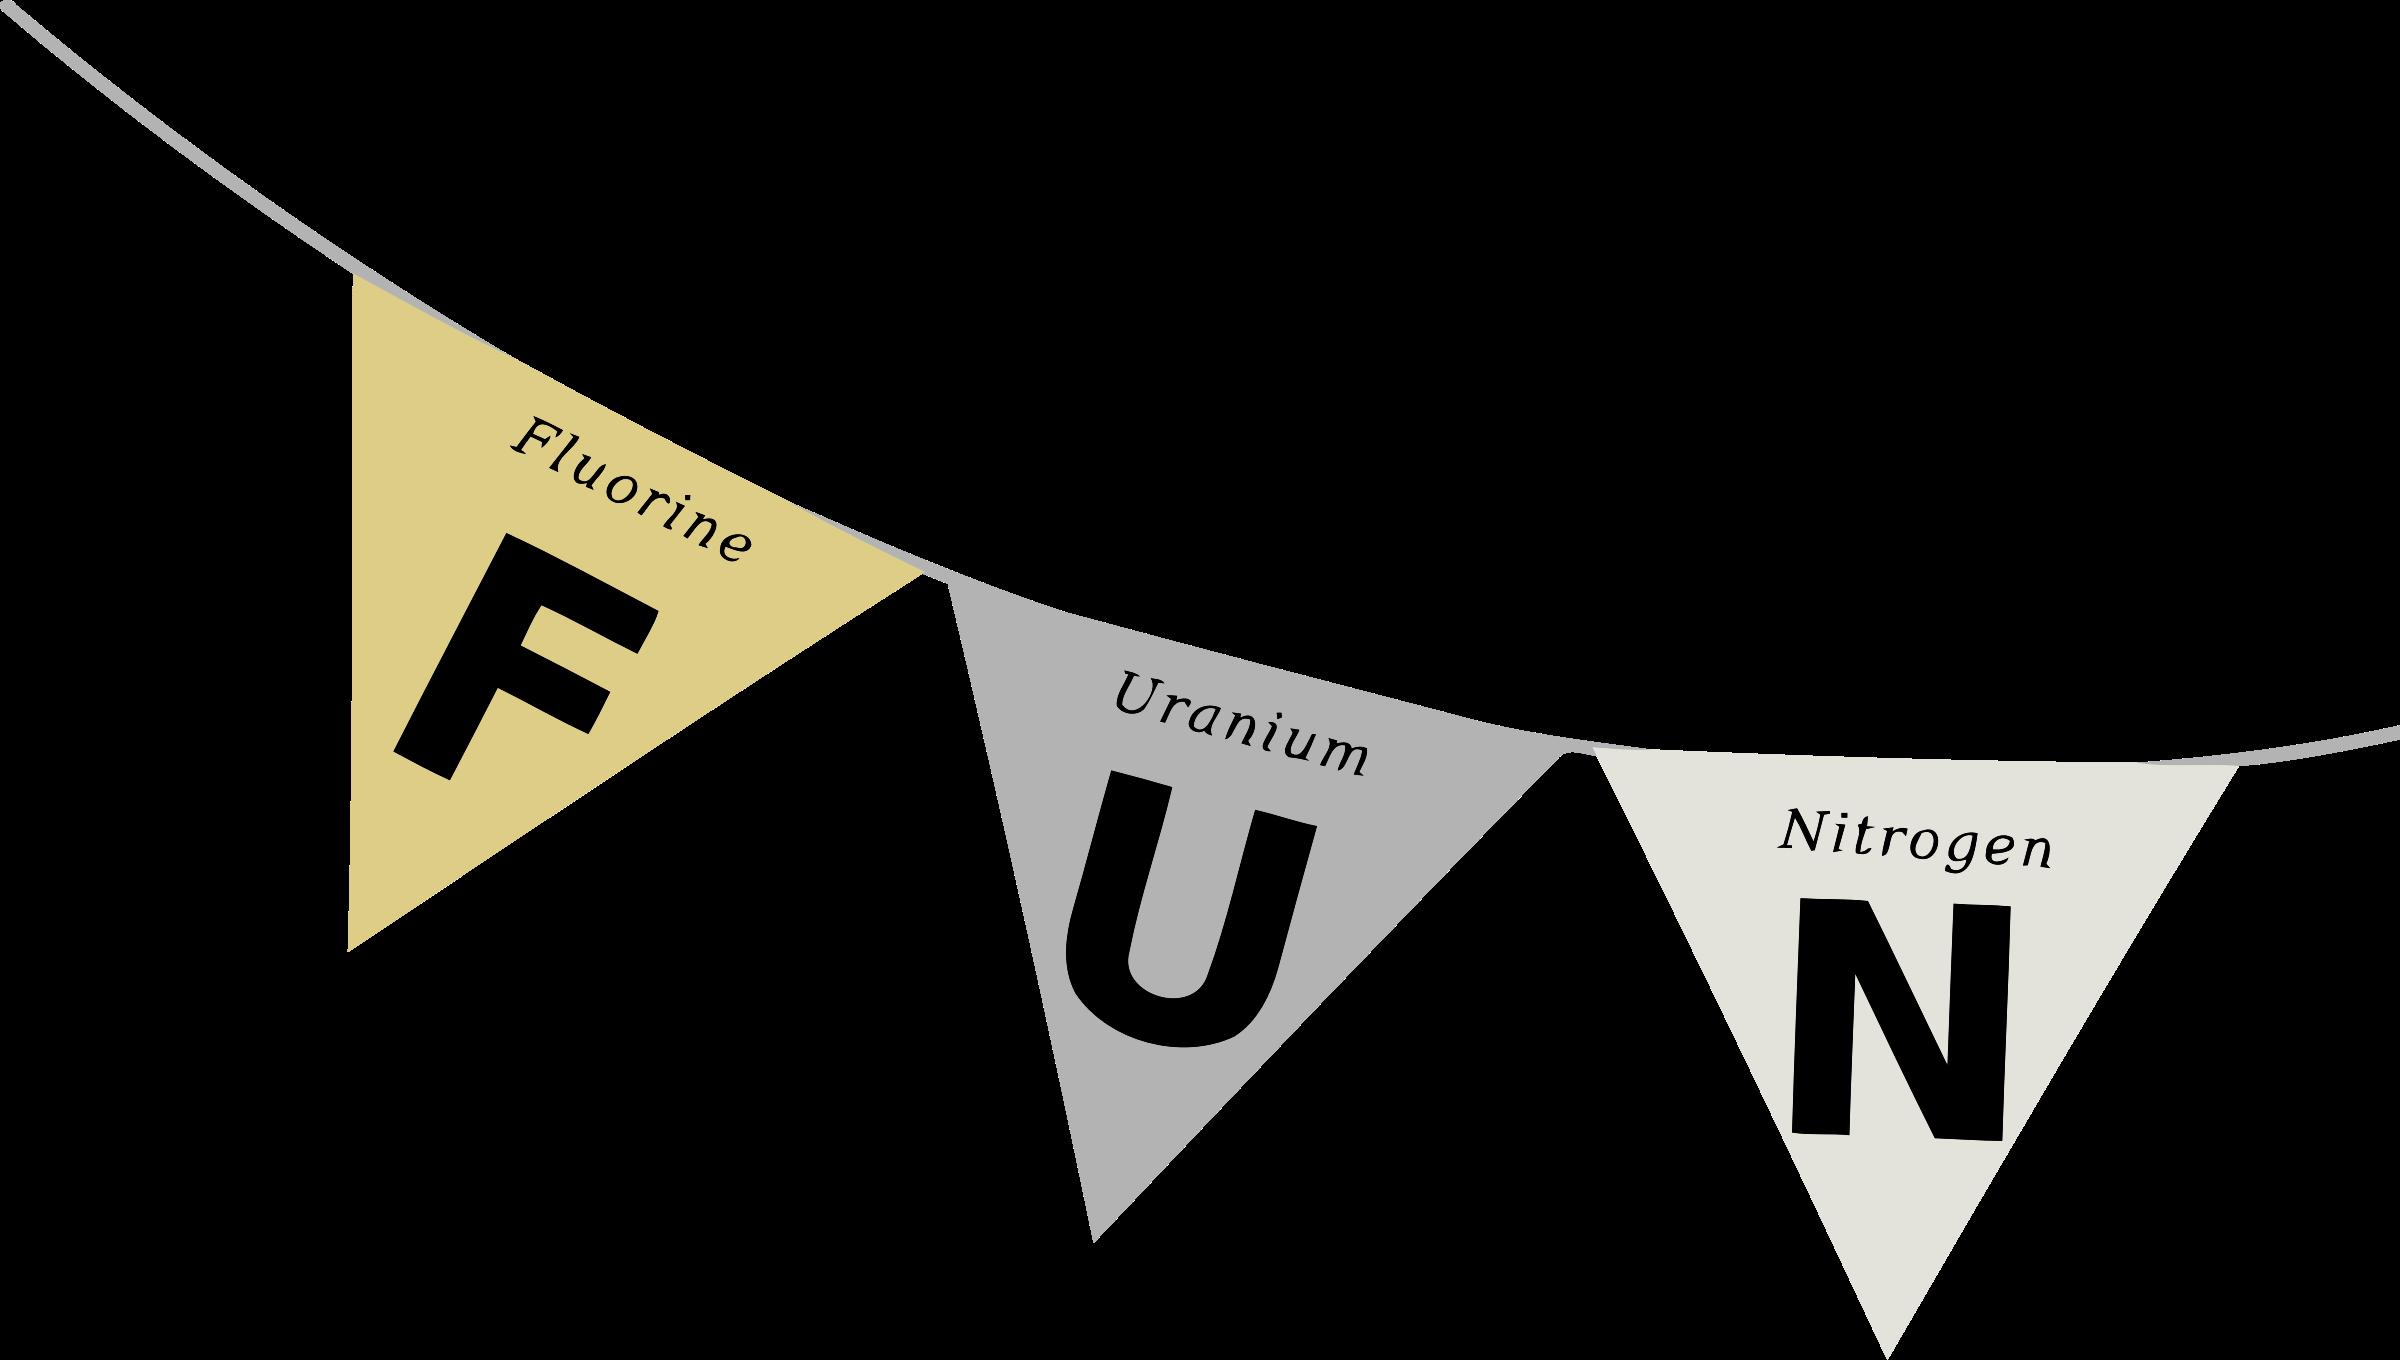 Fun vectorized big image. Design clipart chemistry